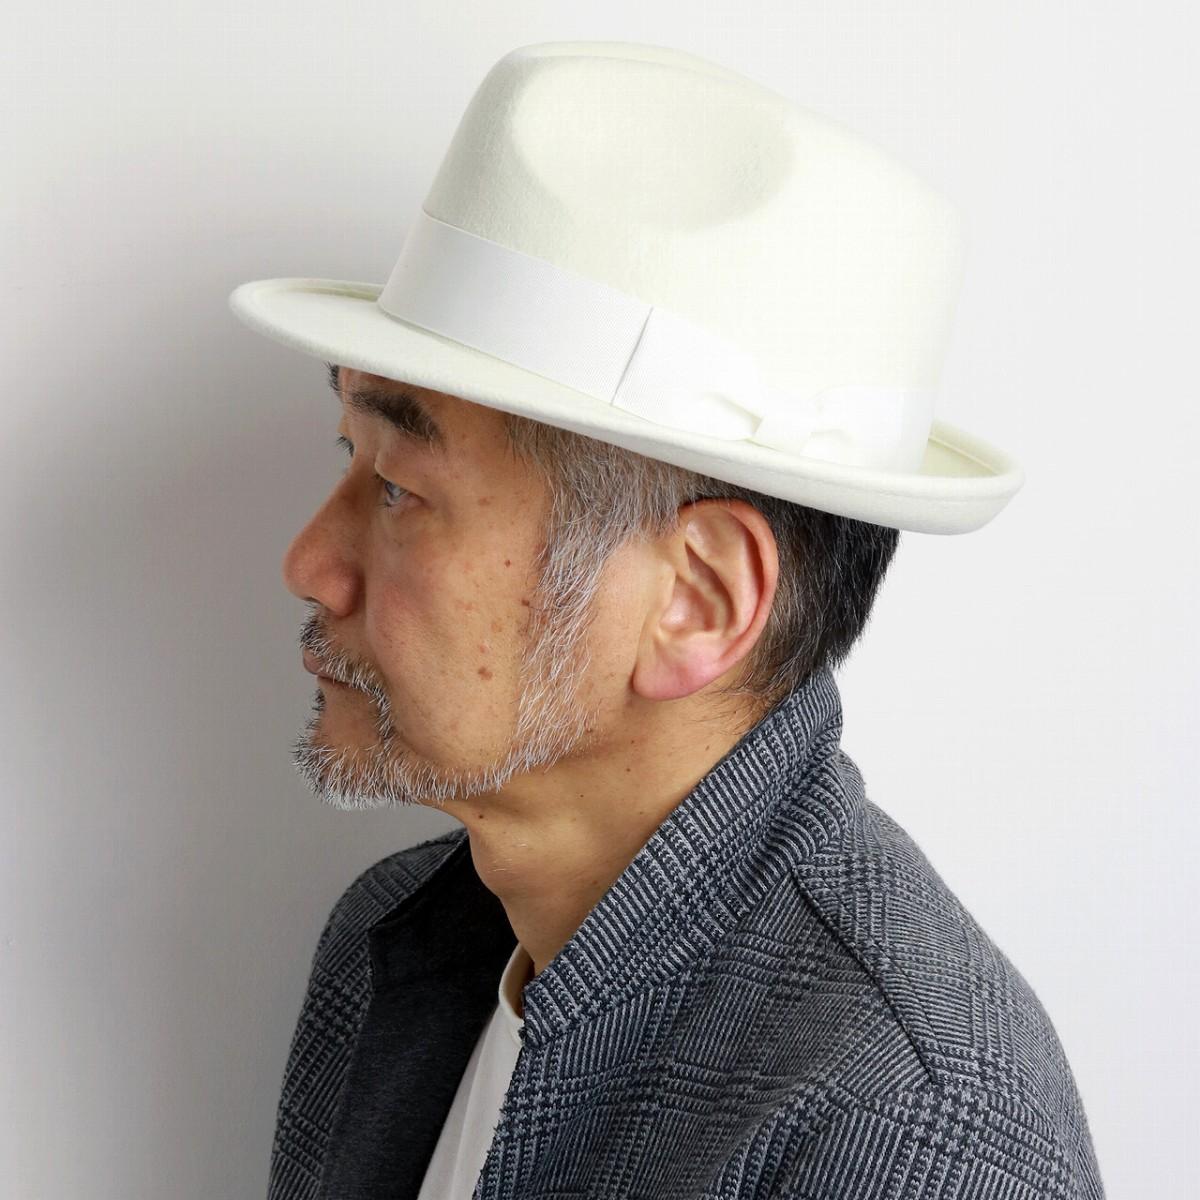 21d63139222 ELEHELM HAT STORE: SCALA hat felt men scalar hat Shin pull plain fabric  wool felt size M L XL trilby hat / white ivory [fedora] which a soft felt  hat ...